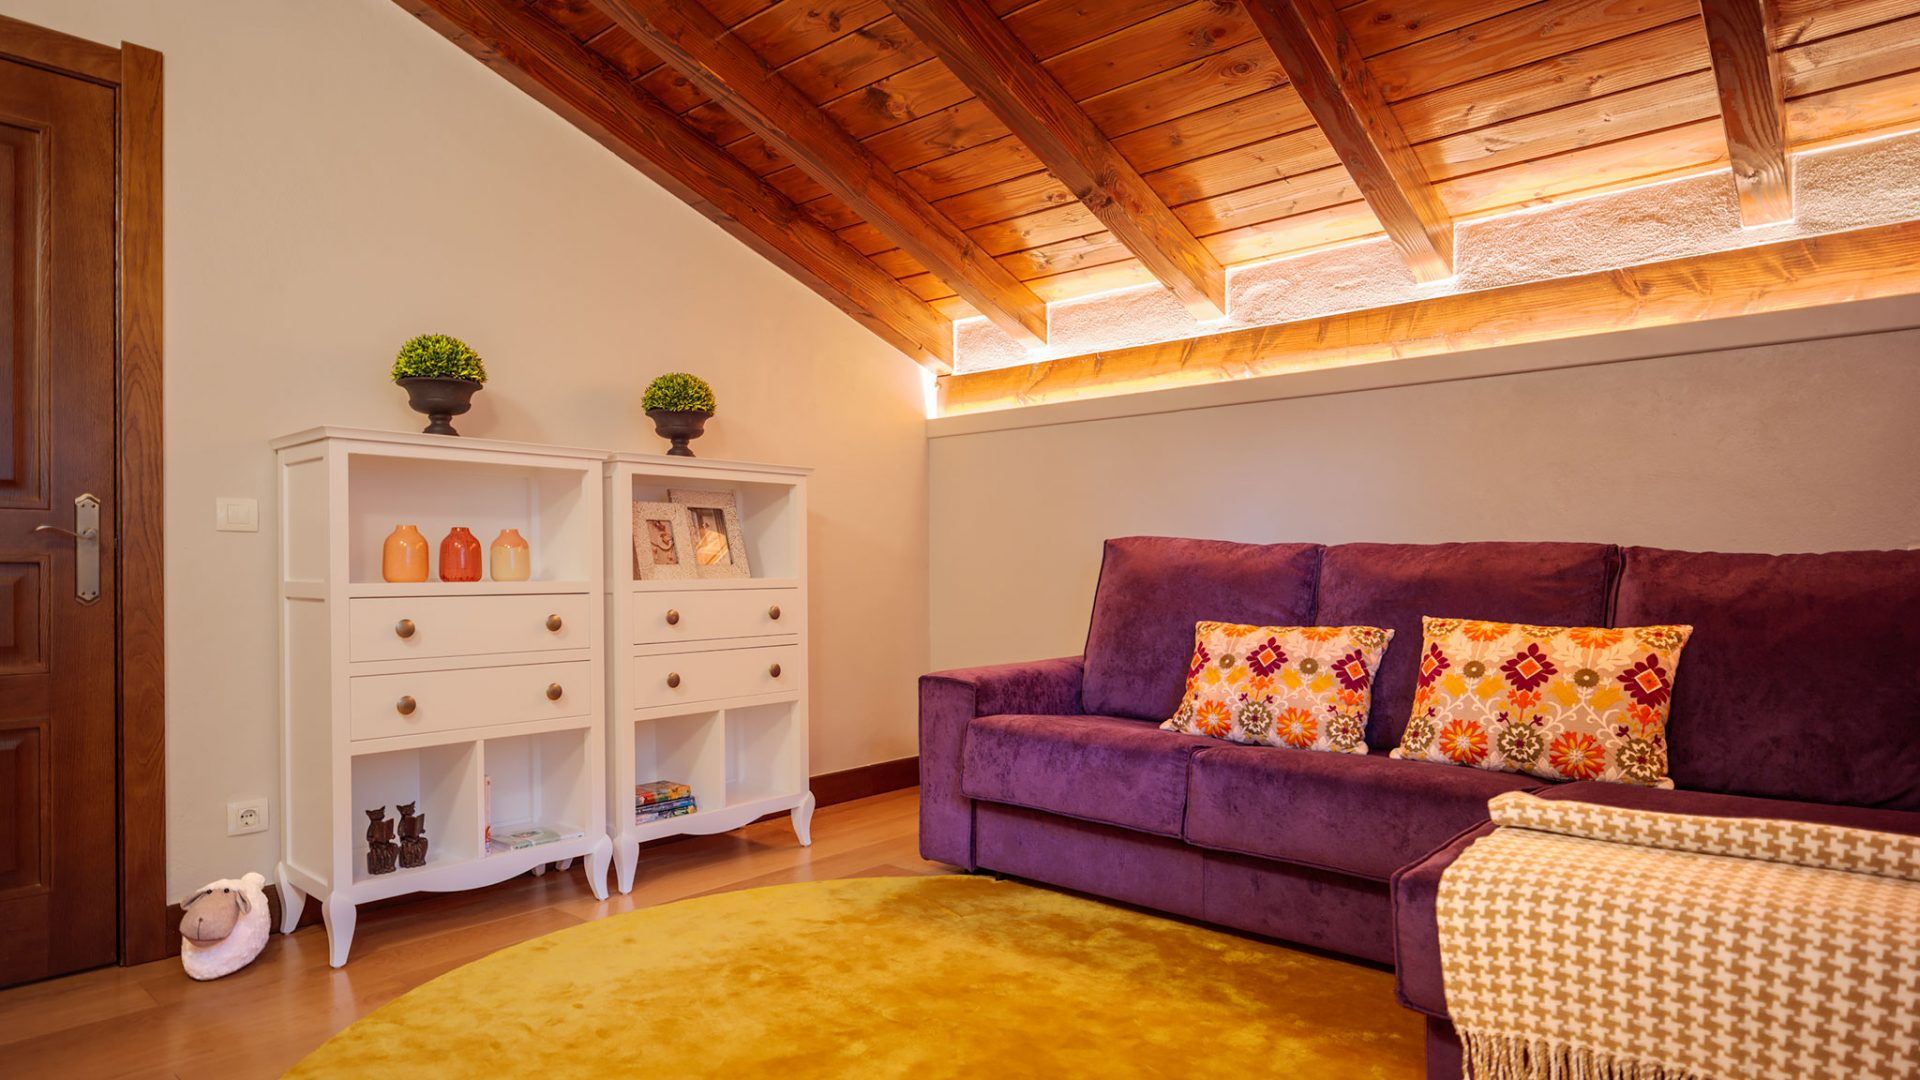 mugari-decoracion-reforma-salita-caserio 15